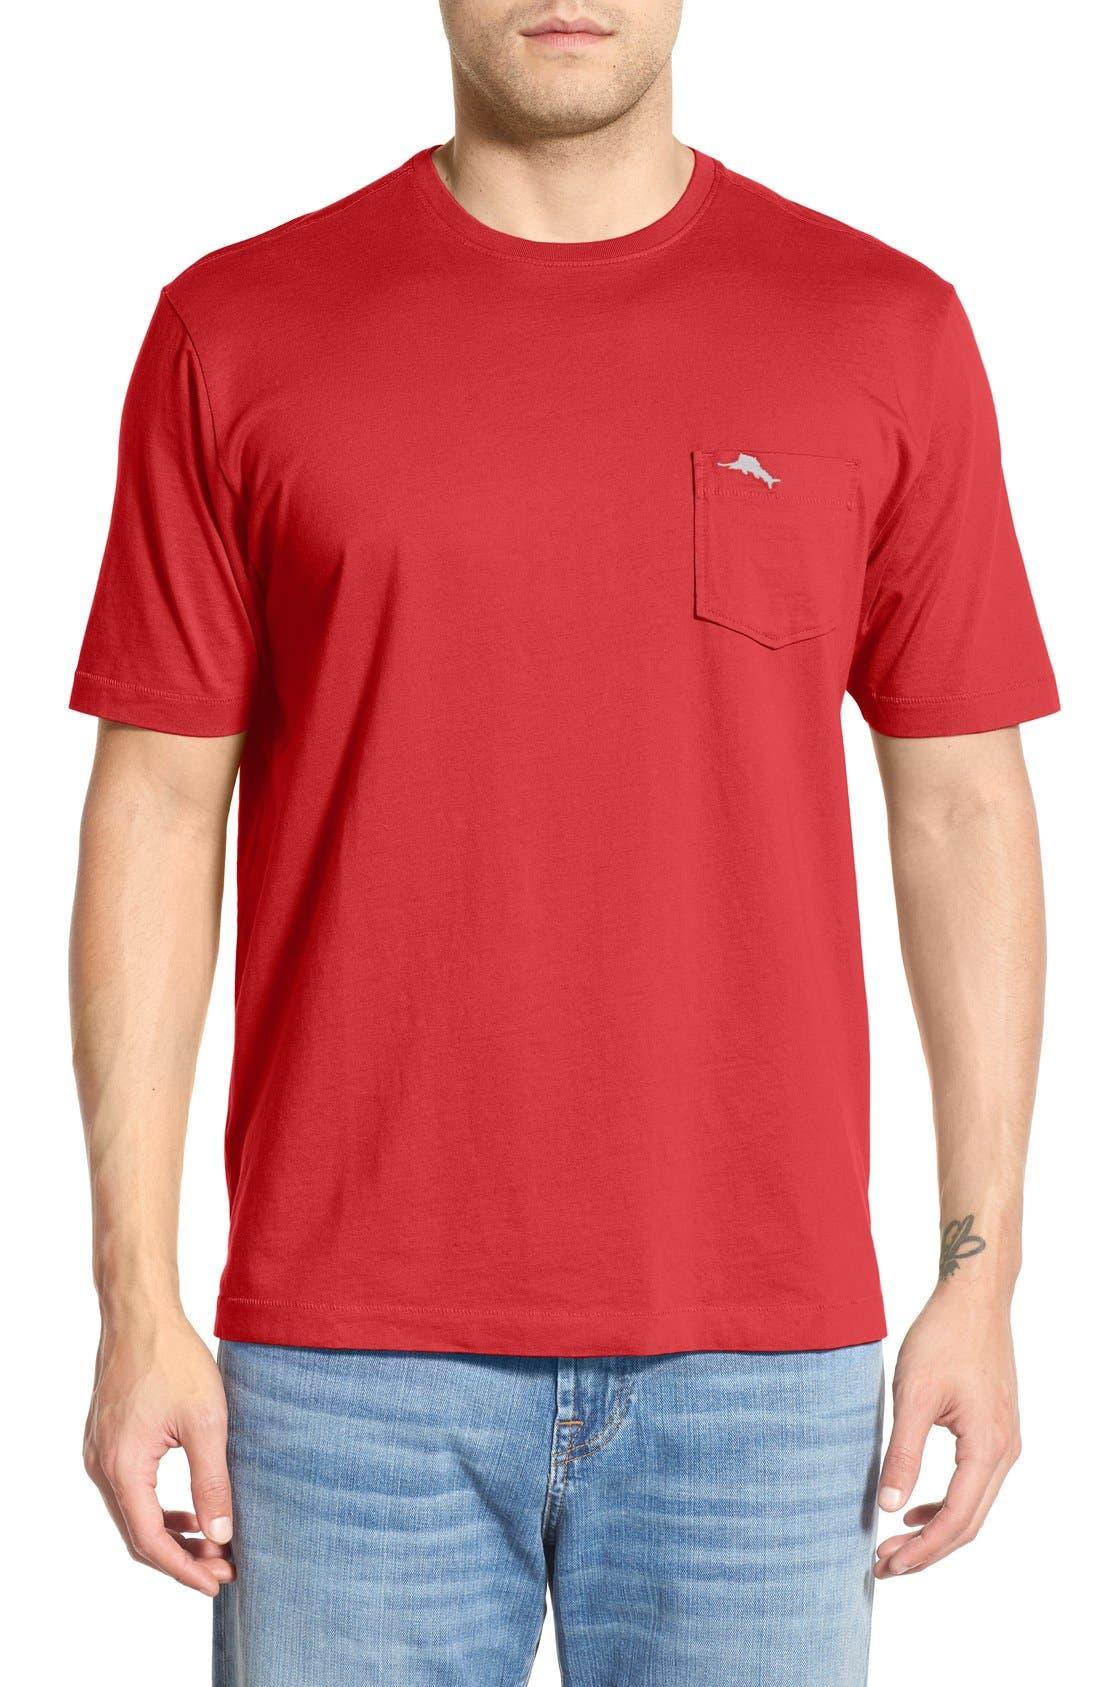 Alternate Image 1 Selected - Tommy Bahama 'New Bali Sky' Original Fit Crewneck Pocket T-Shirt